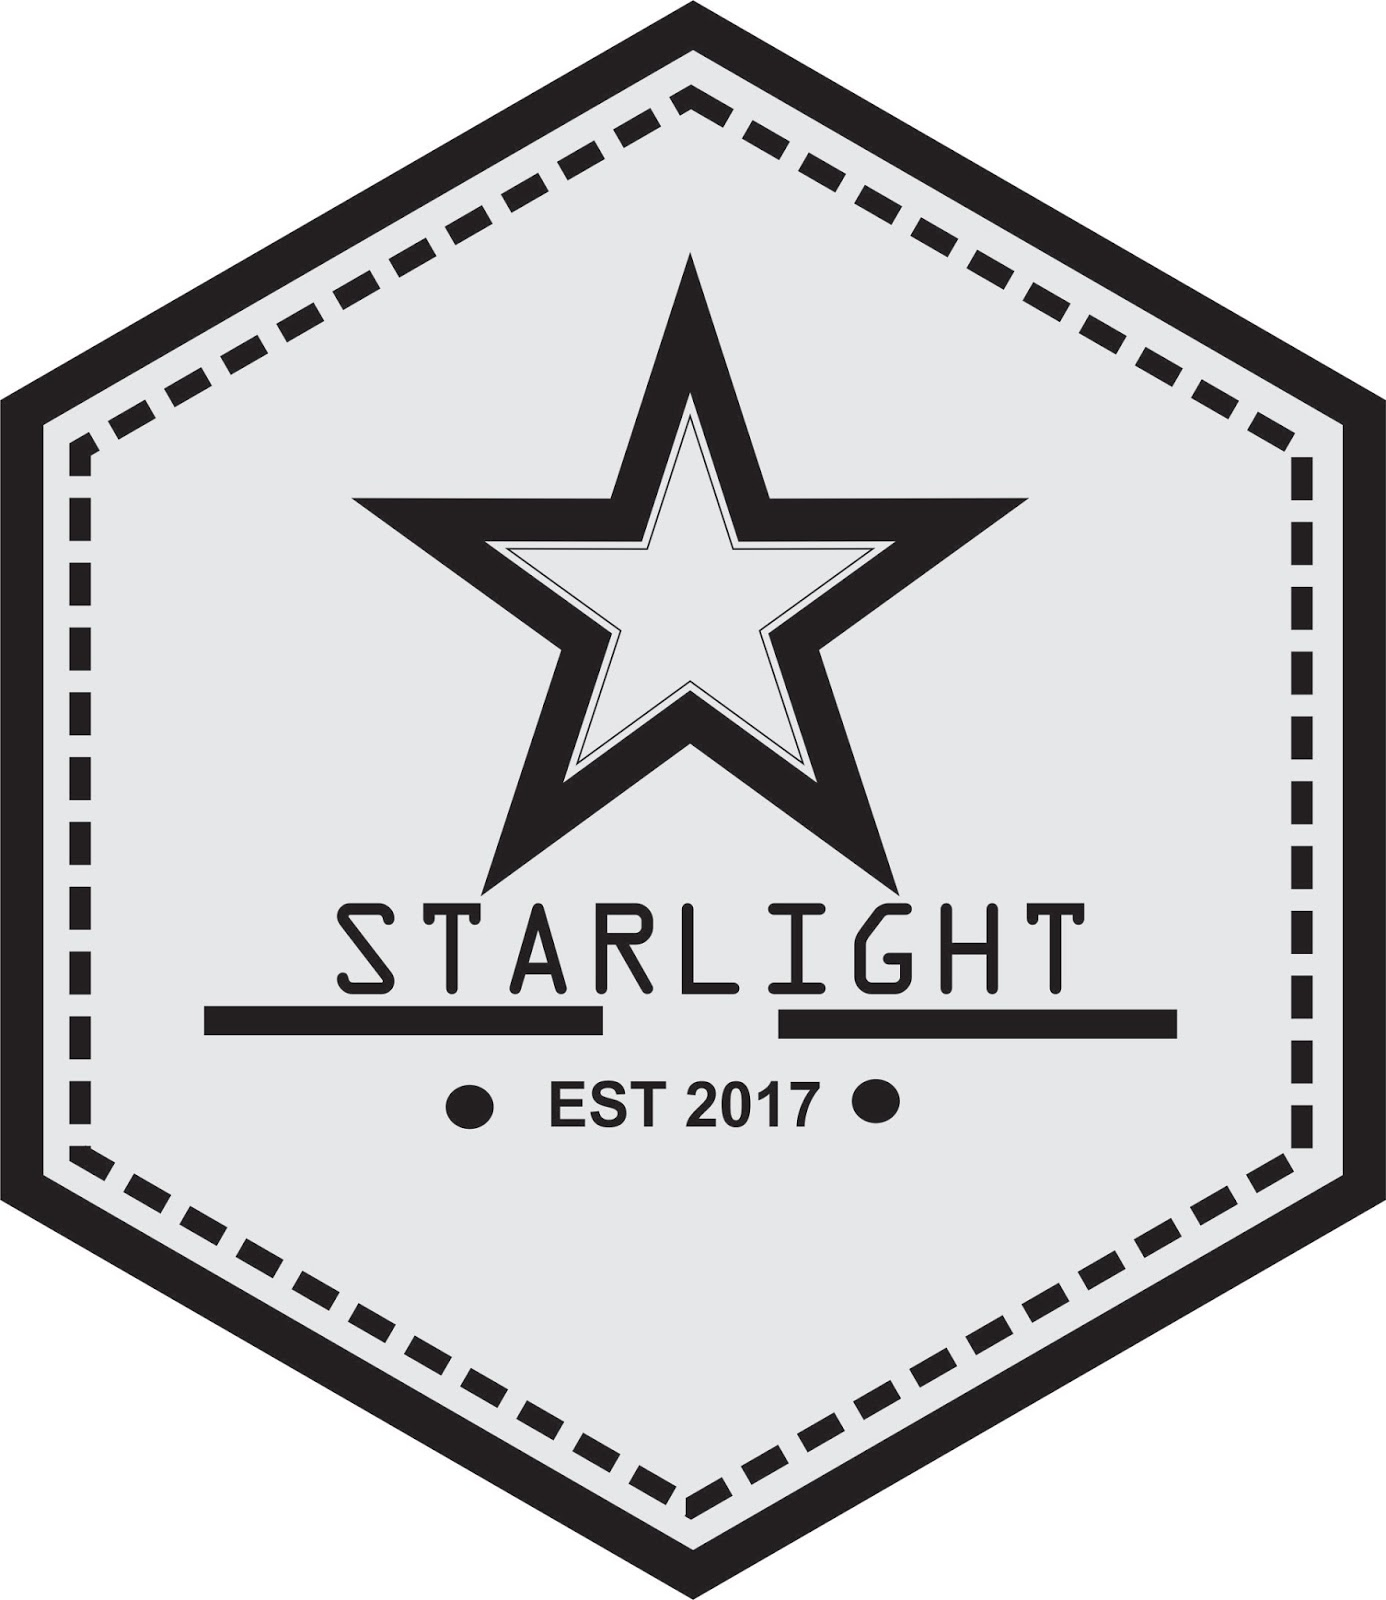 ririn wijiastuti desain grafis logo menggunakan corel